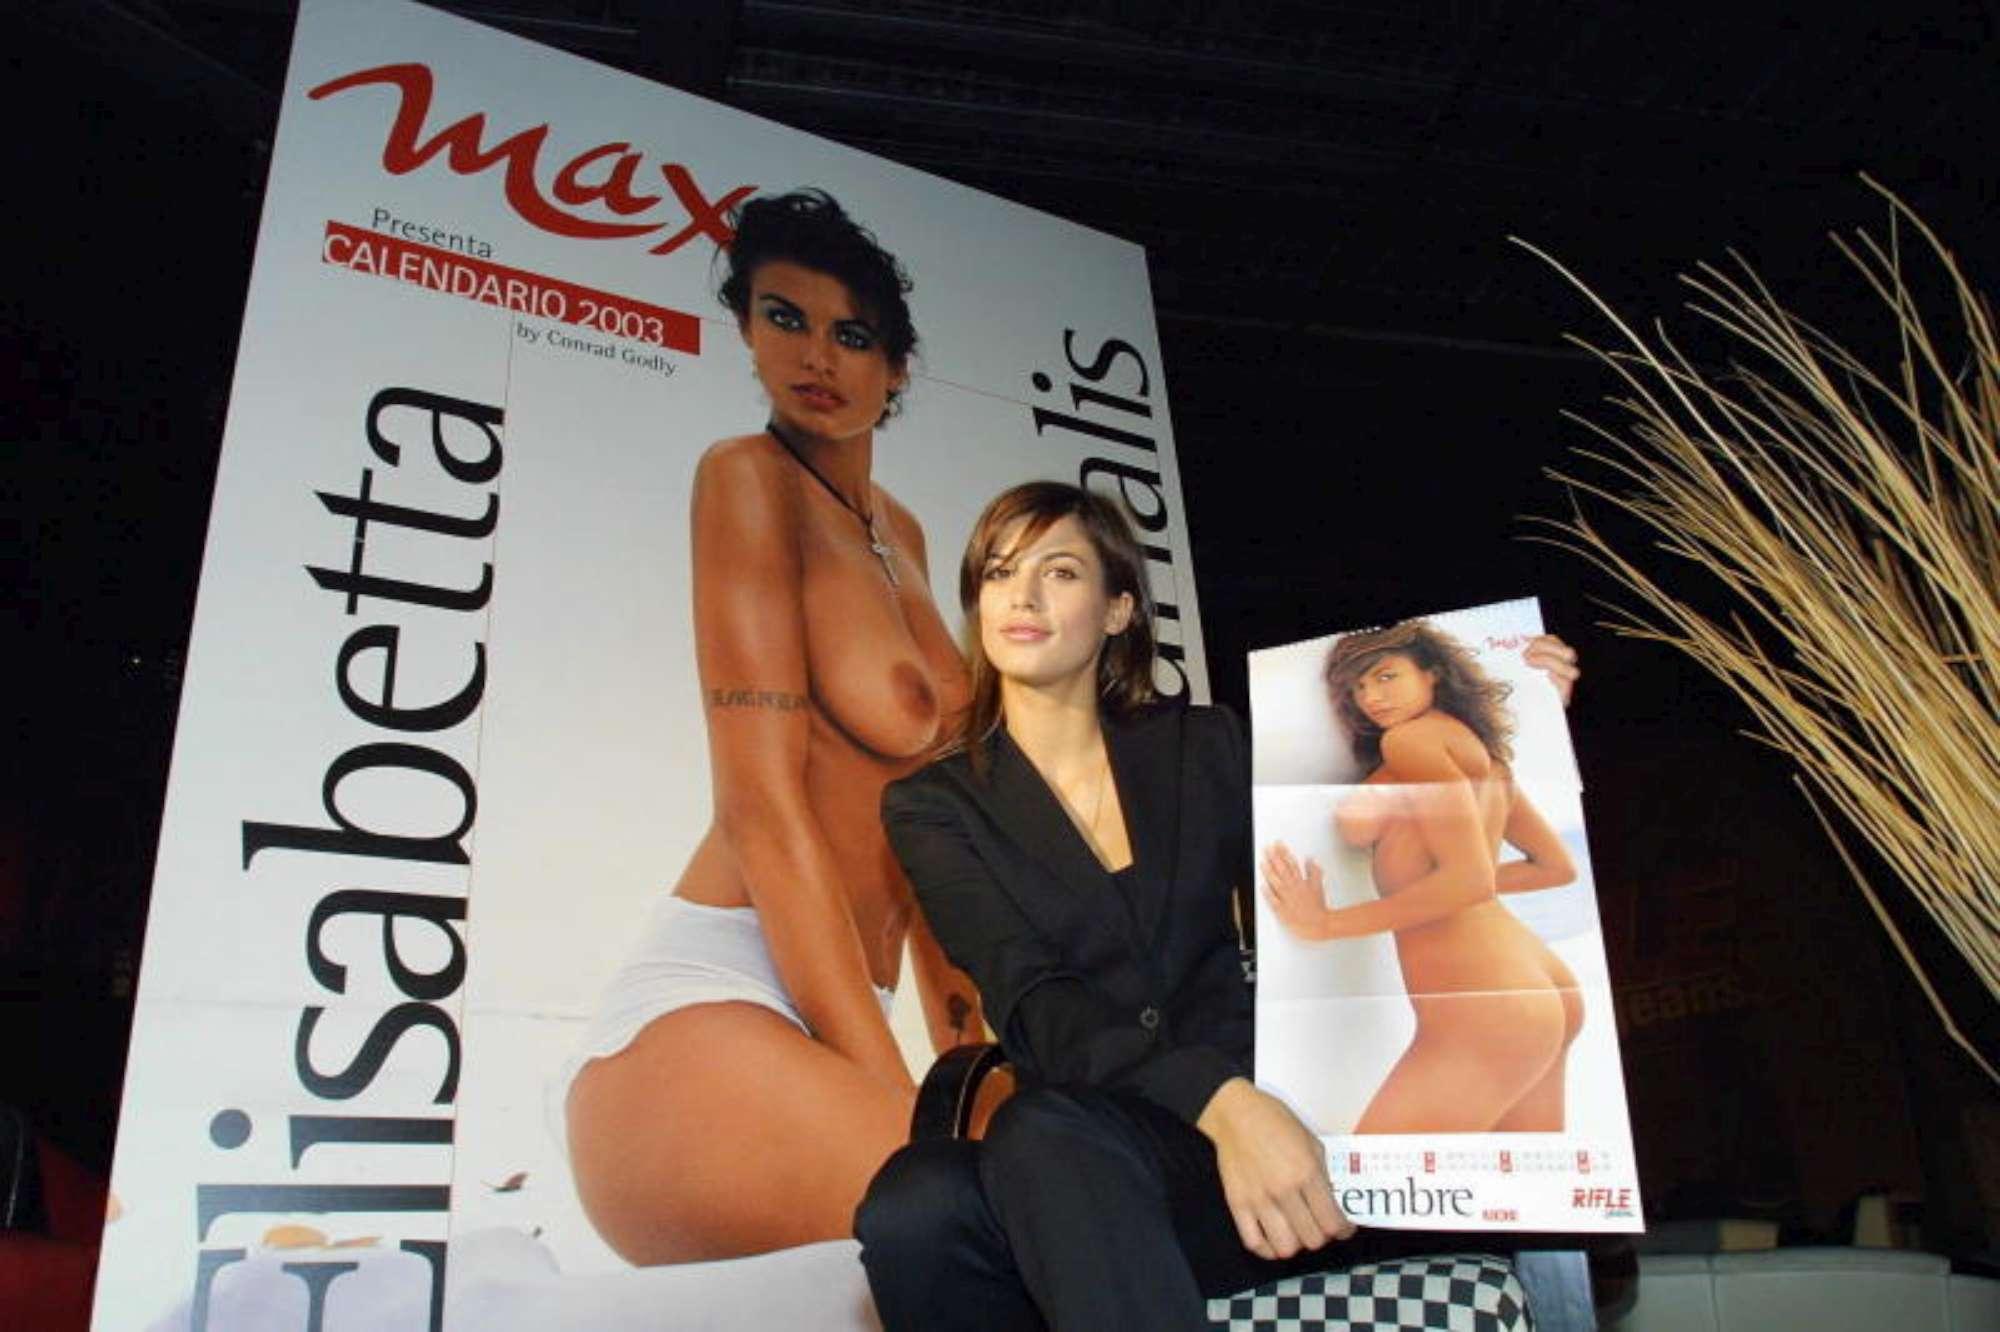 Calendario Canalis Corvaglia 2002.Elisabetta Canalis Spegne 40 Candeline Guarda Tutte Le Foto